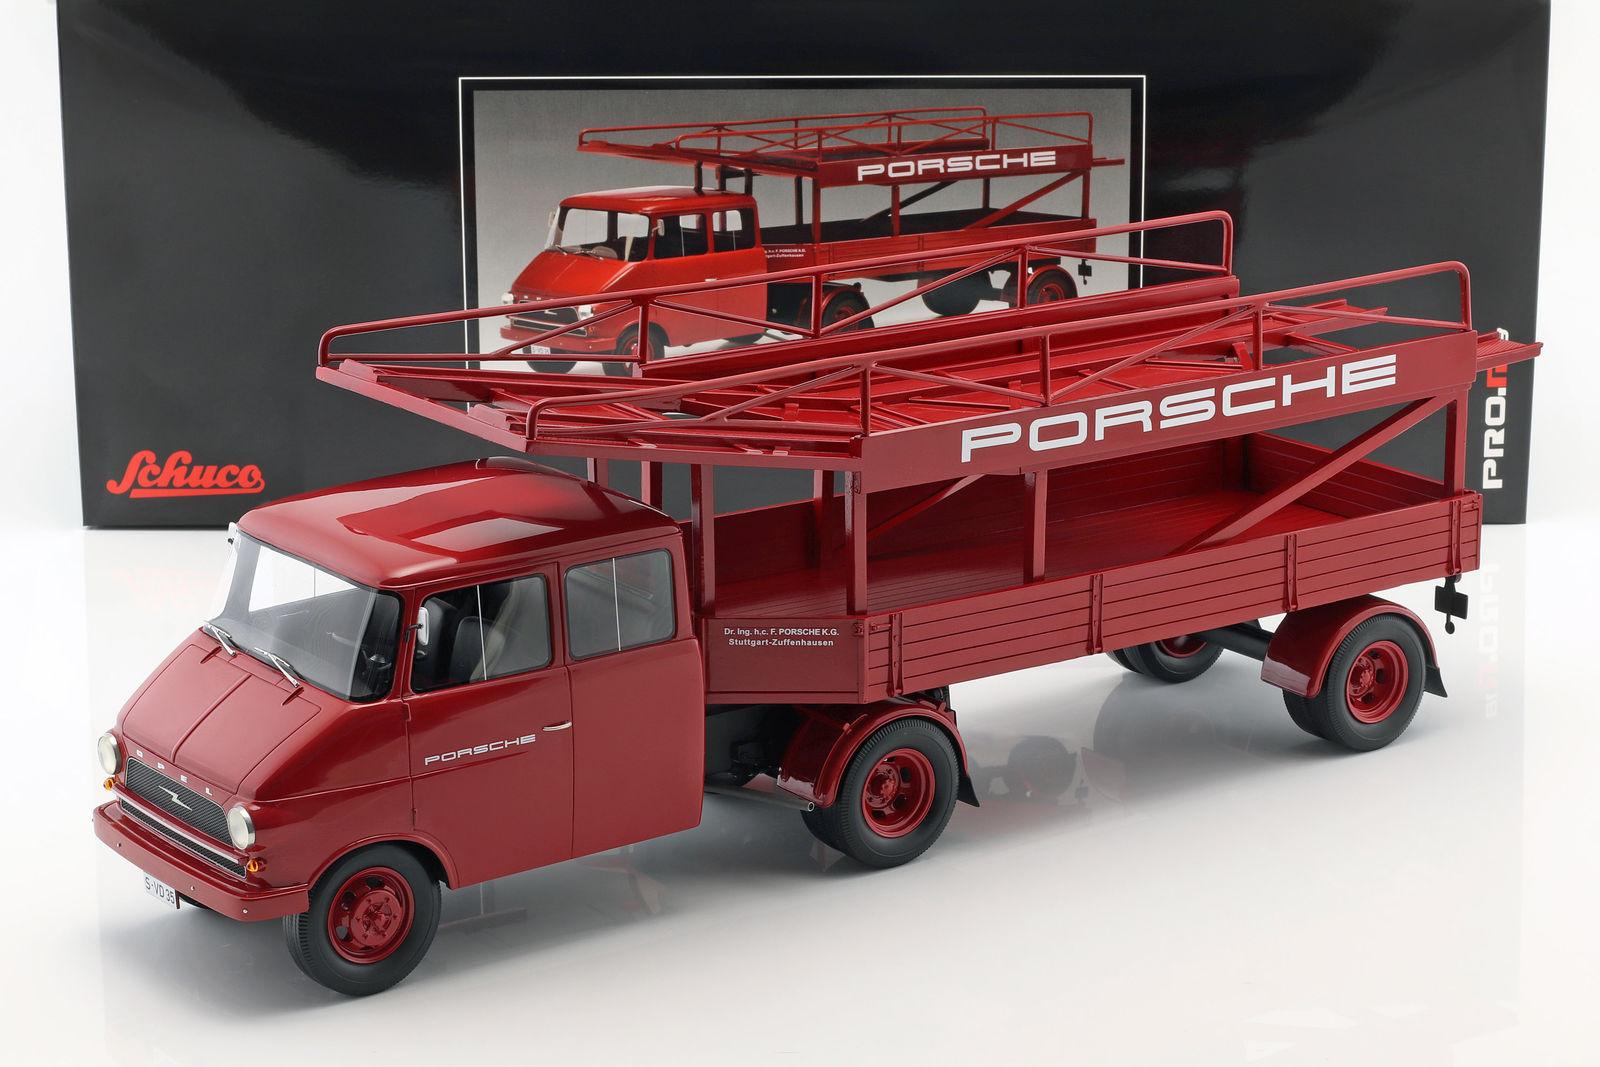 Schuco シュコー 1/18 ミニカー レジン プロポーションモデル 1952年モデル オペル Blitz Truck Transporter OPEL - BLITZ TRUCK CAR TRANSPORTER PORSCHE RACING 1952 1:18 Schuco